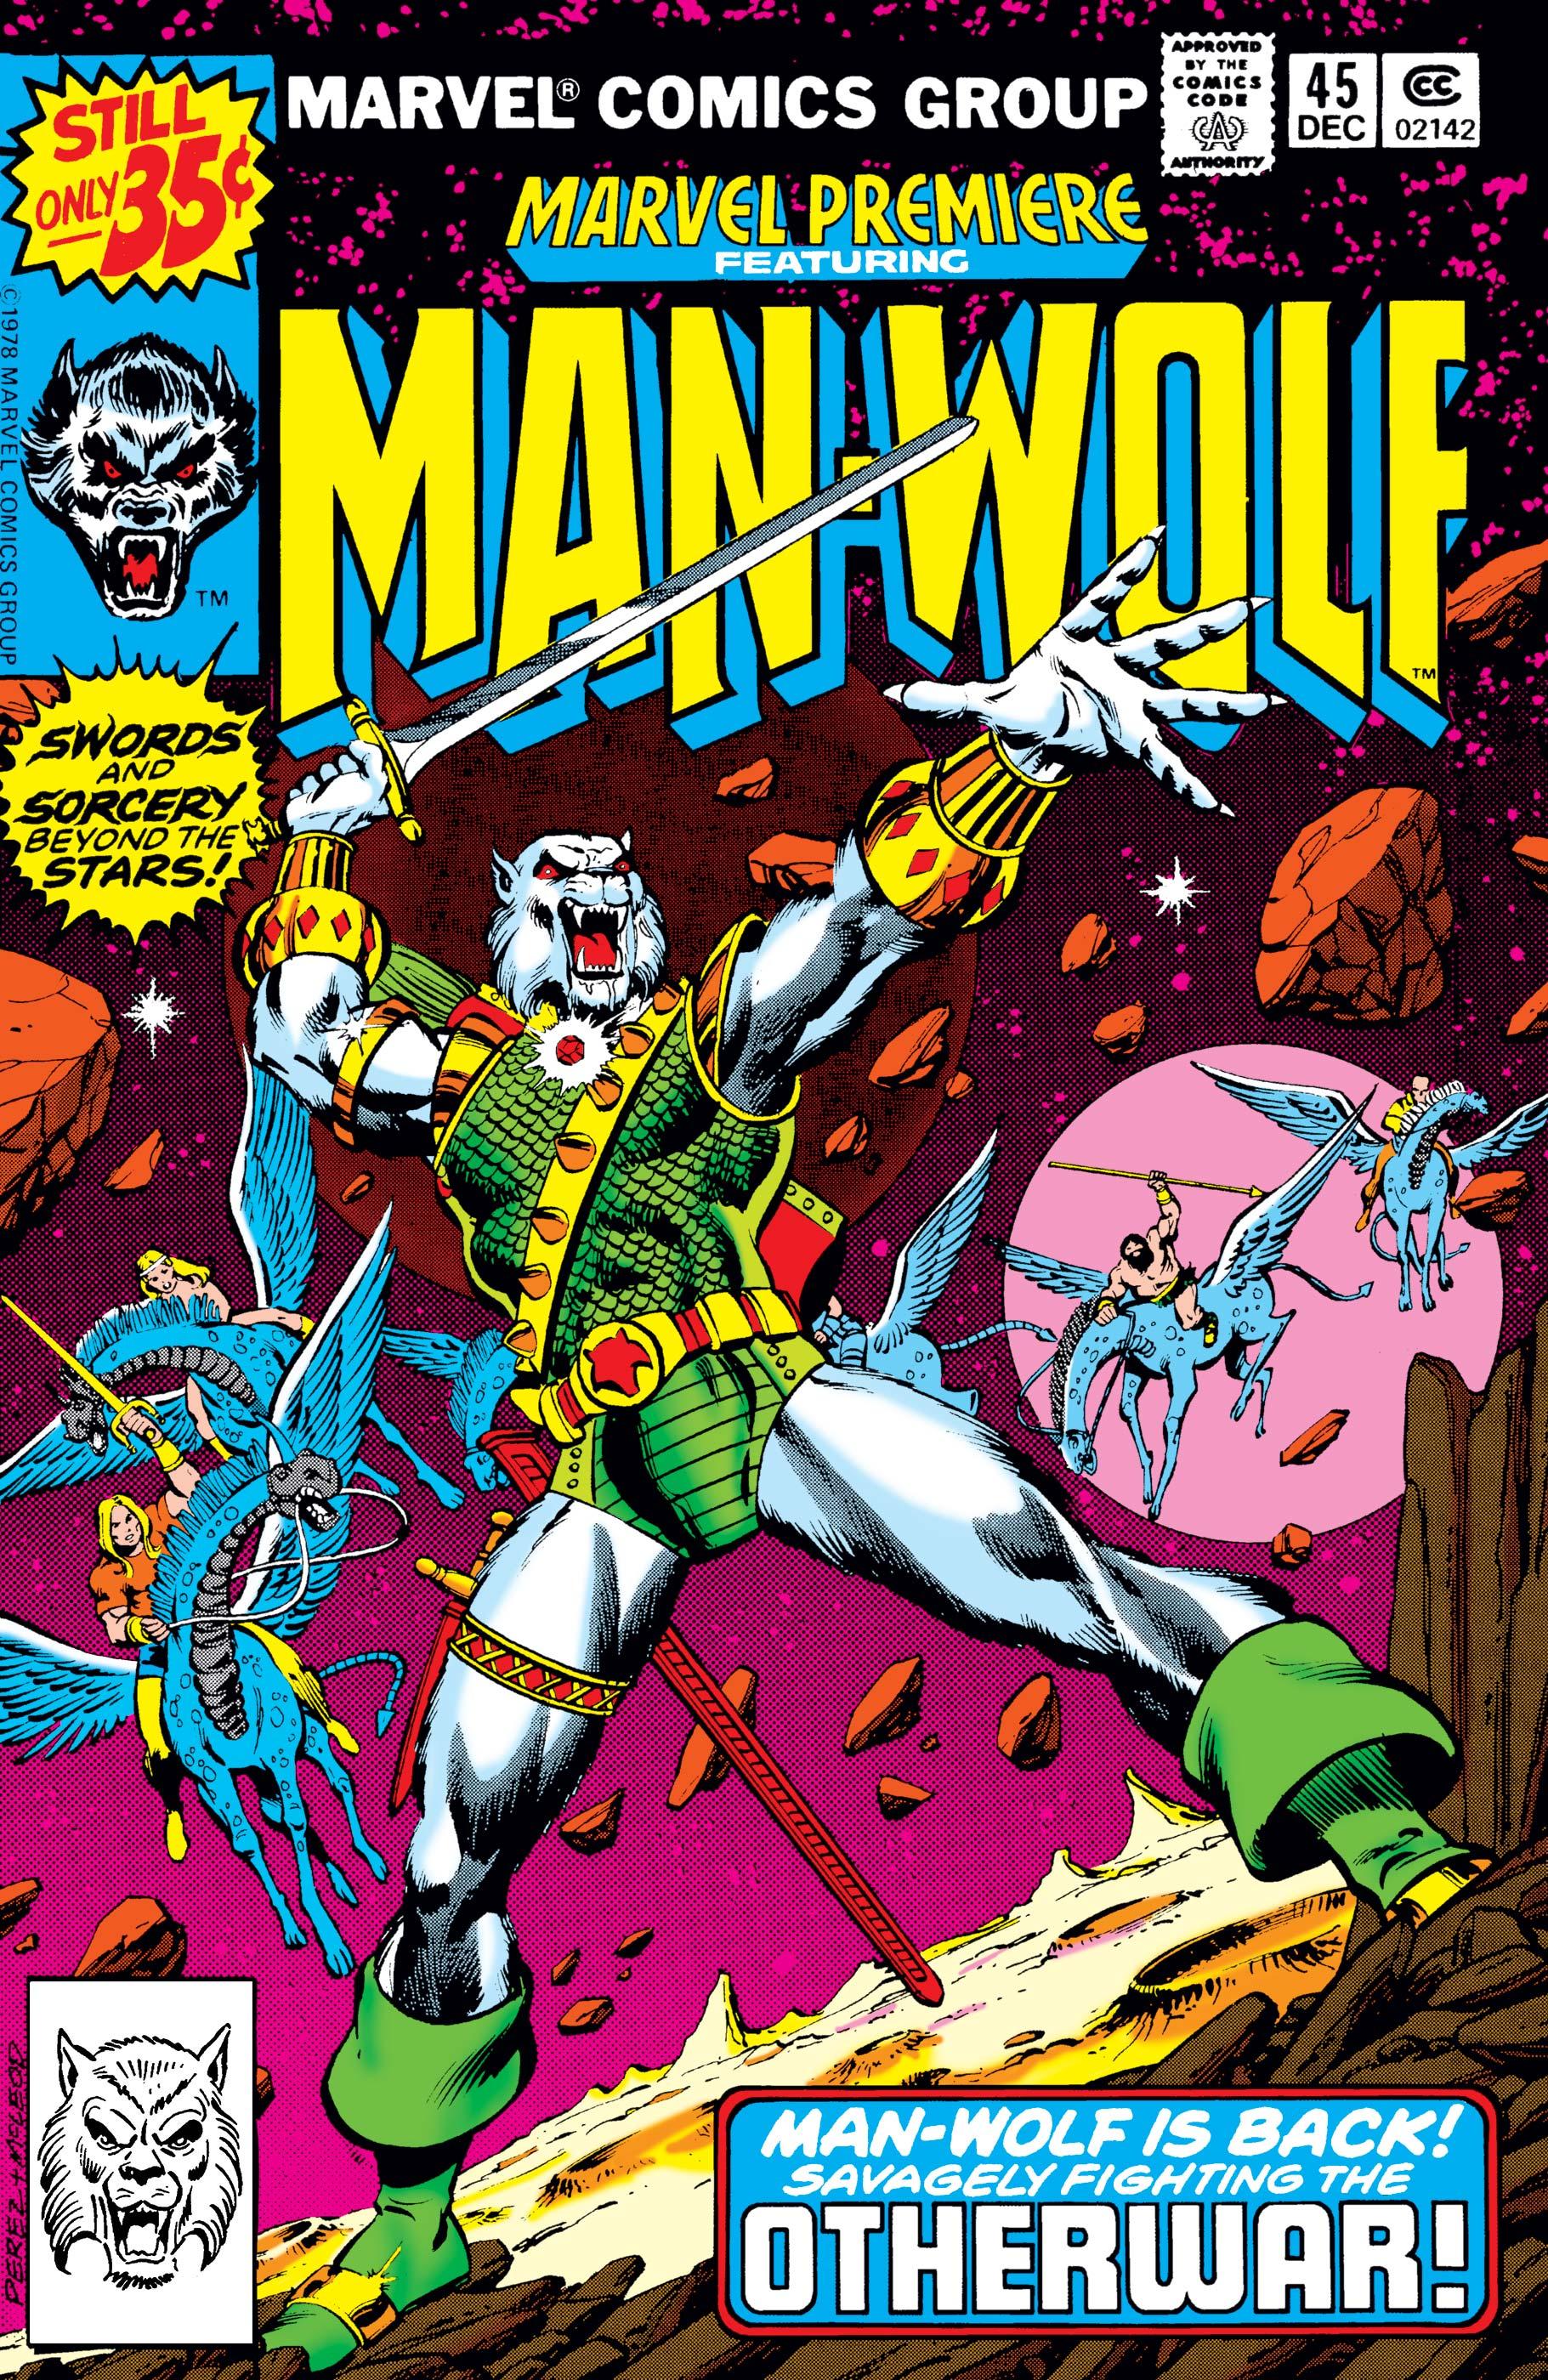 Marvel Premiere (1972) #45